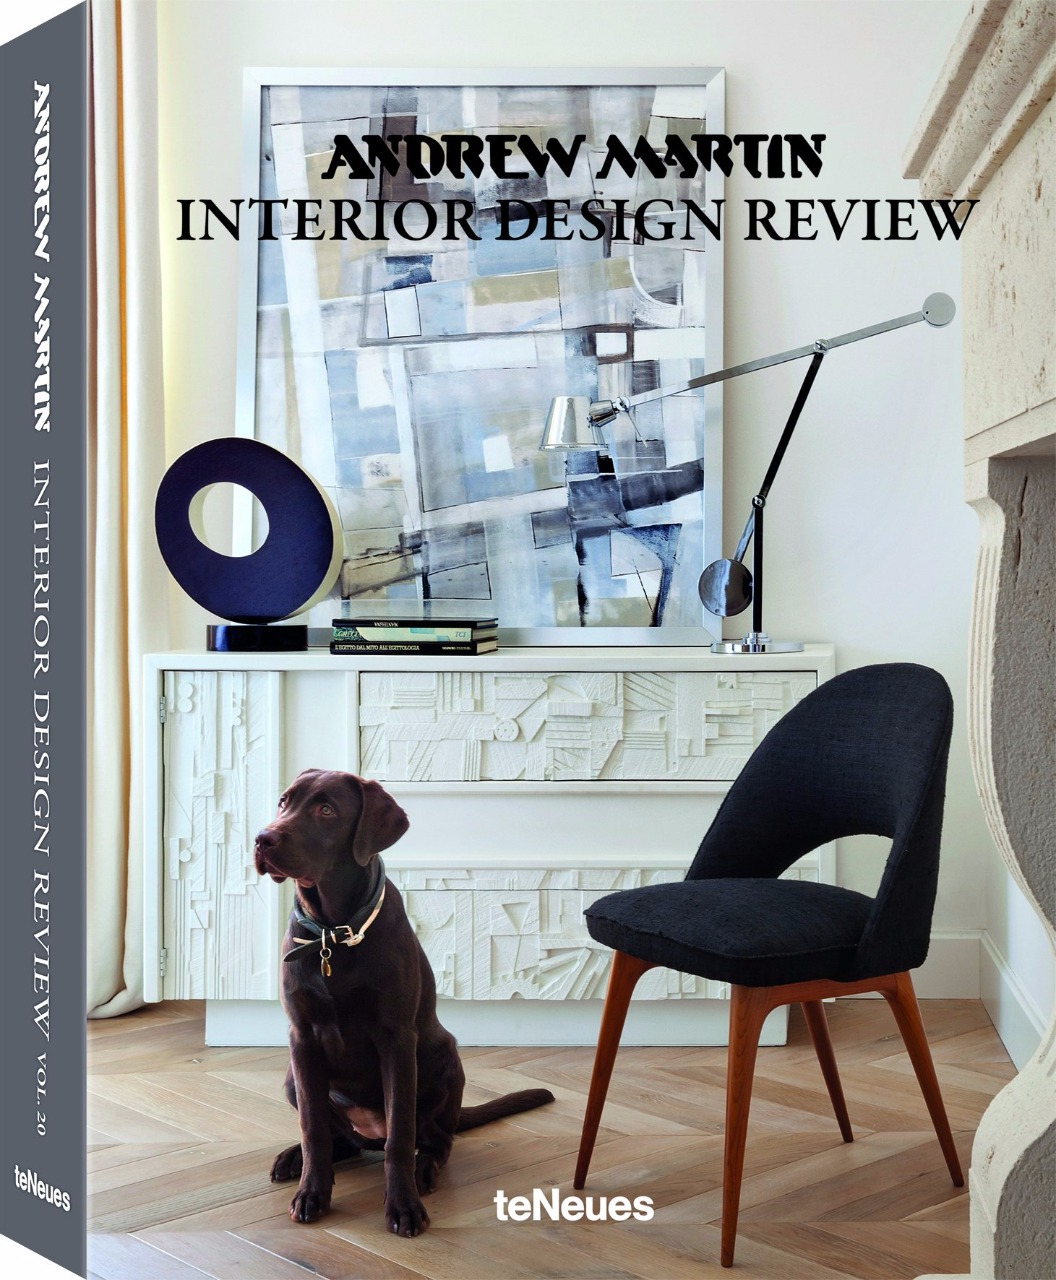 Andrew Martin Interior Design Review Volume 20 ISBN